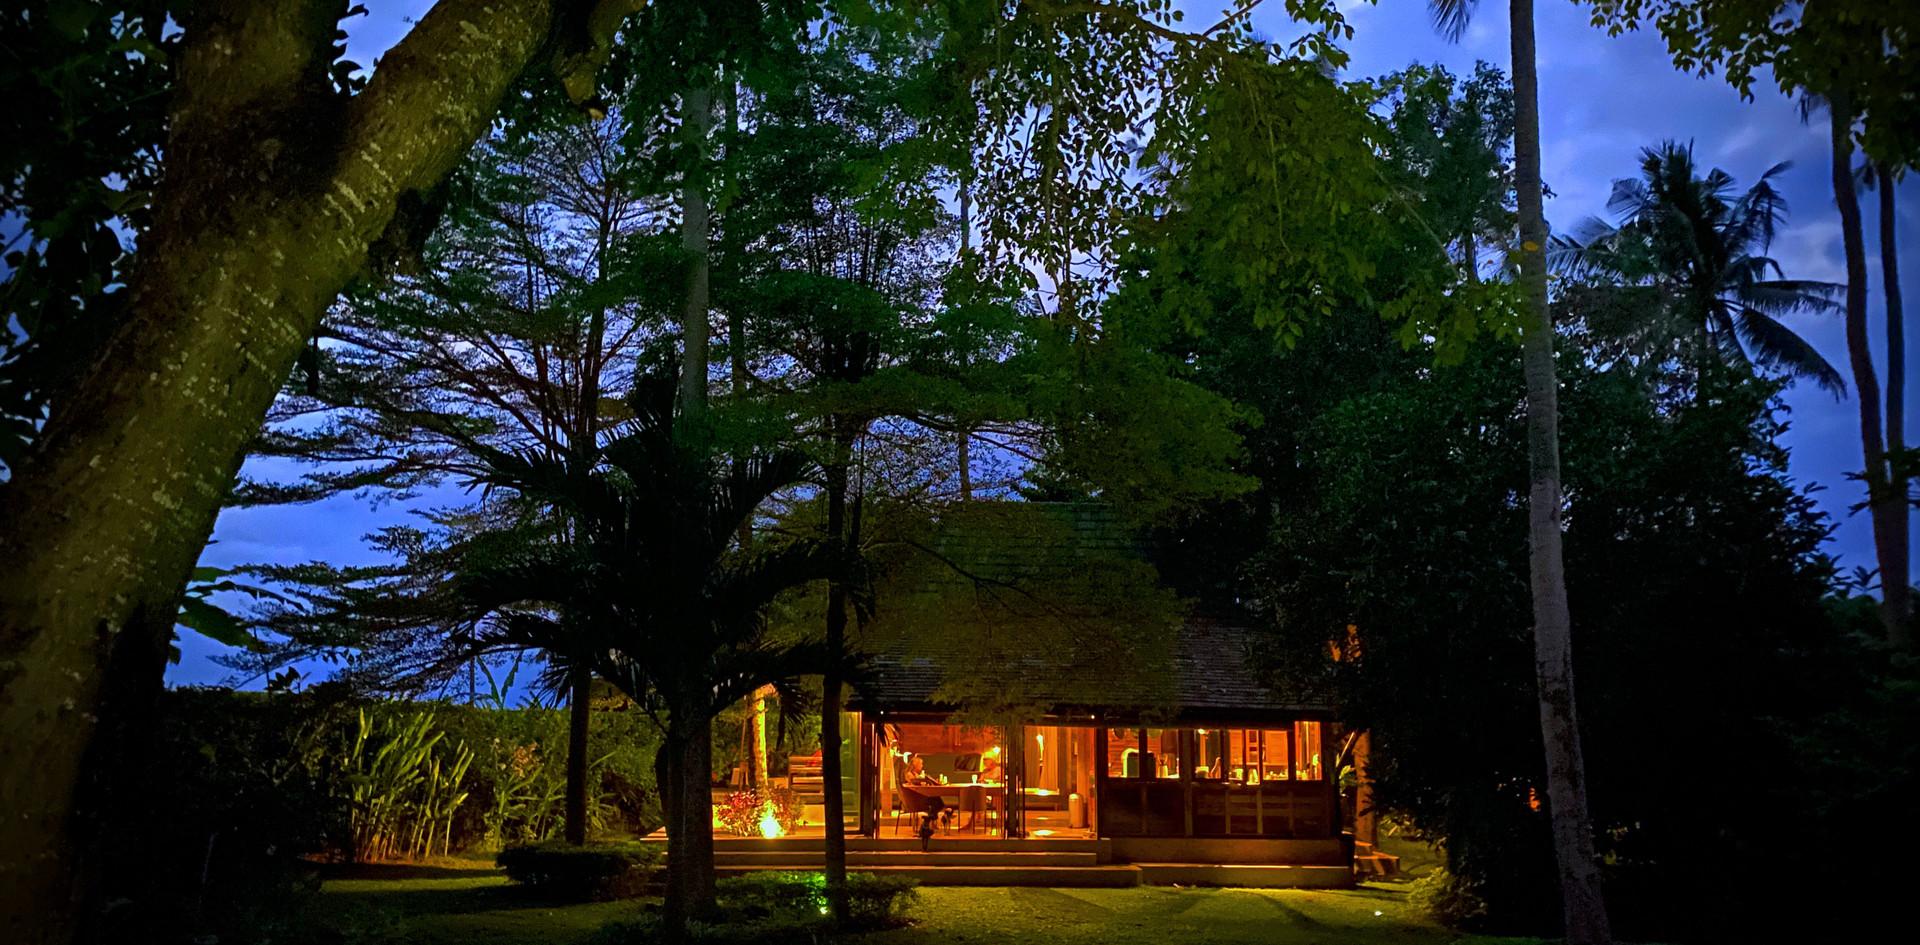 The Main House at night